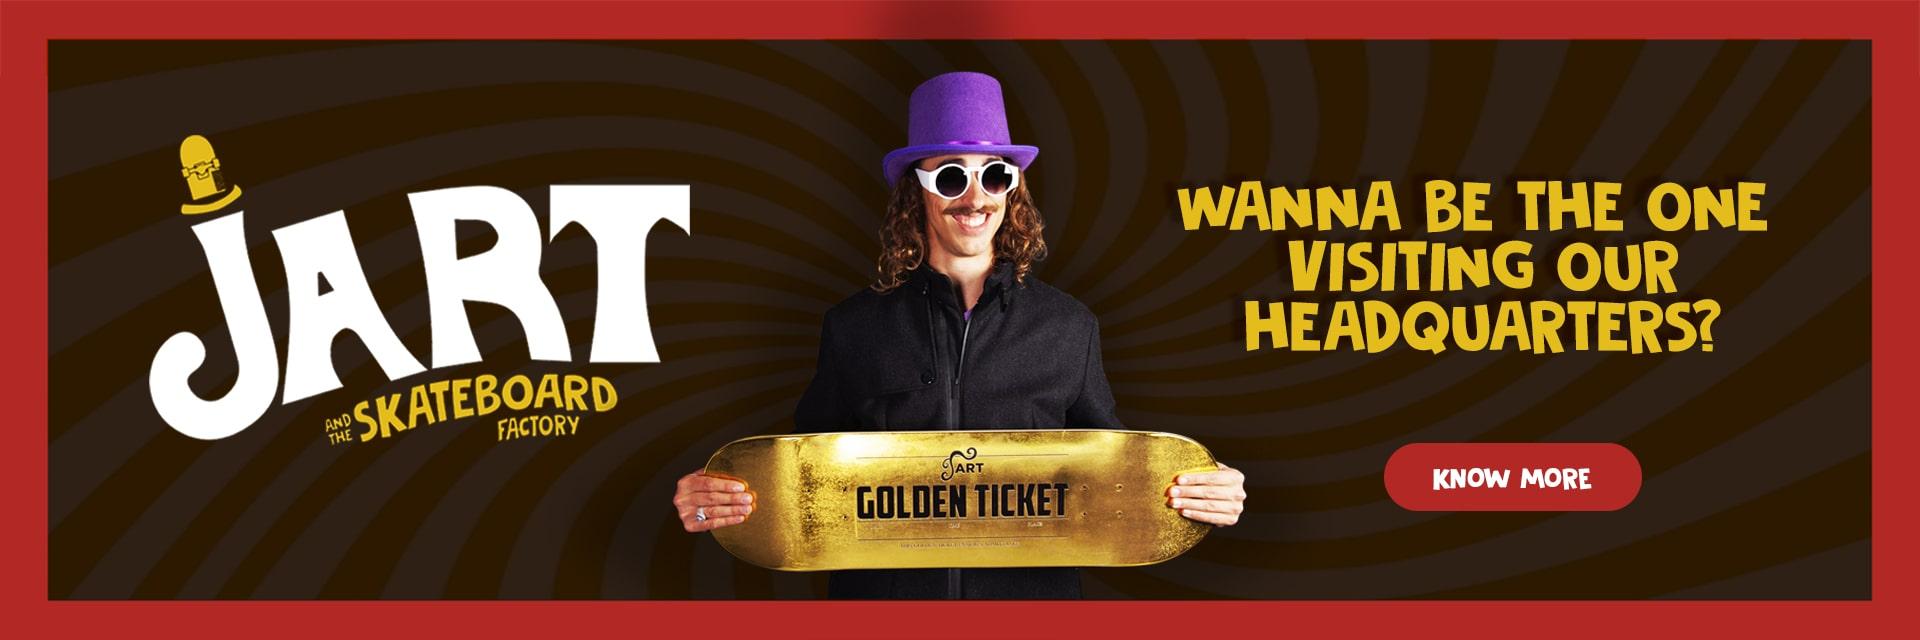 Concorso jart Skateboard golden ticket